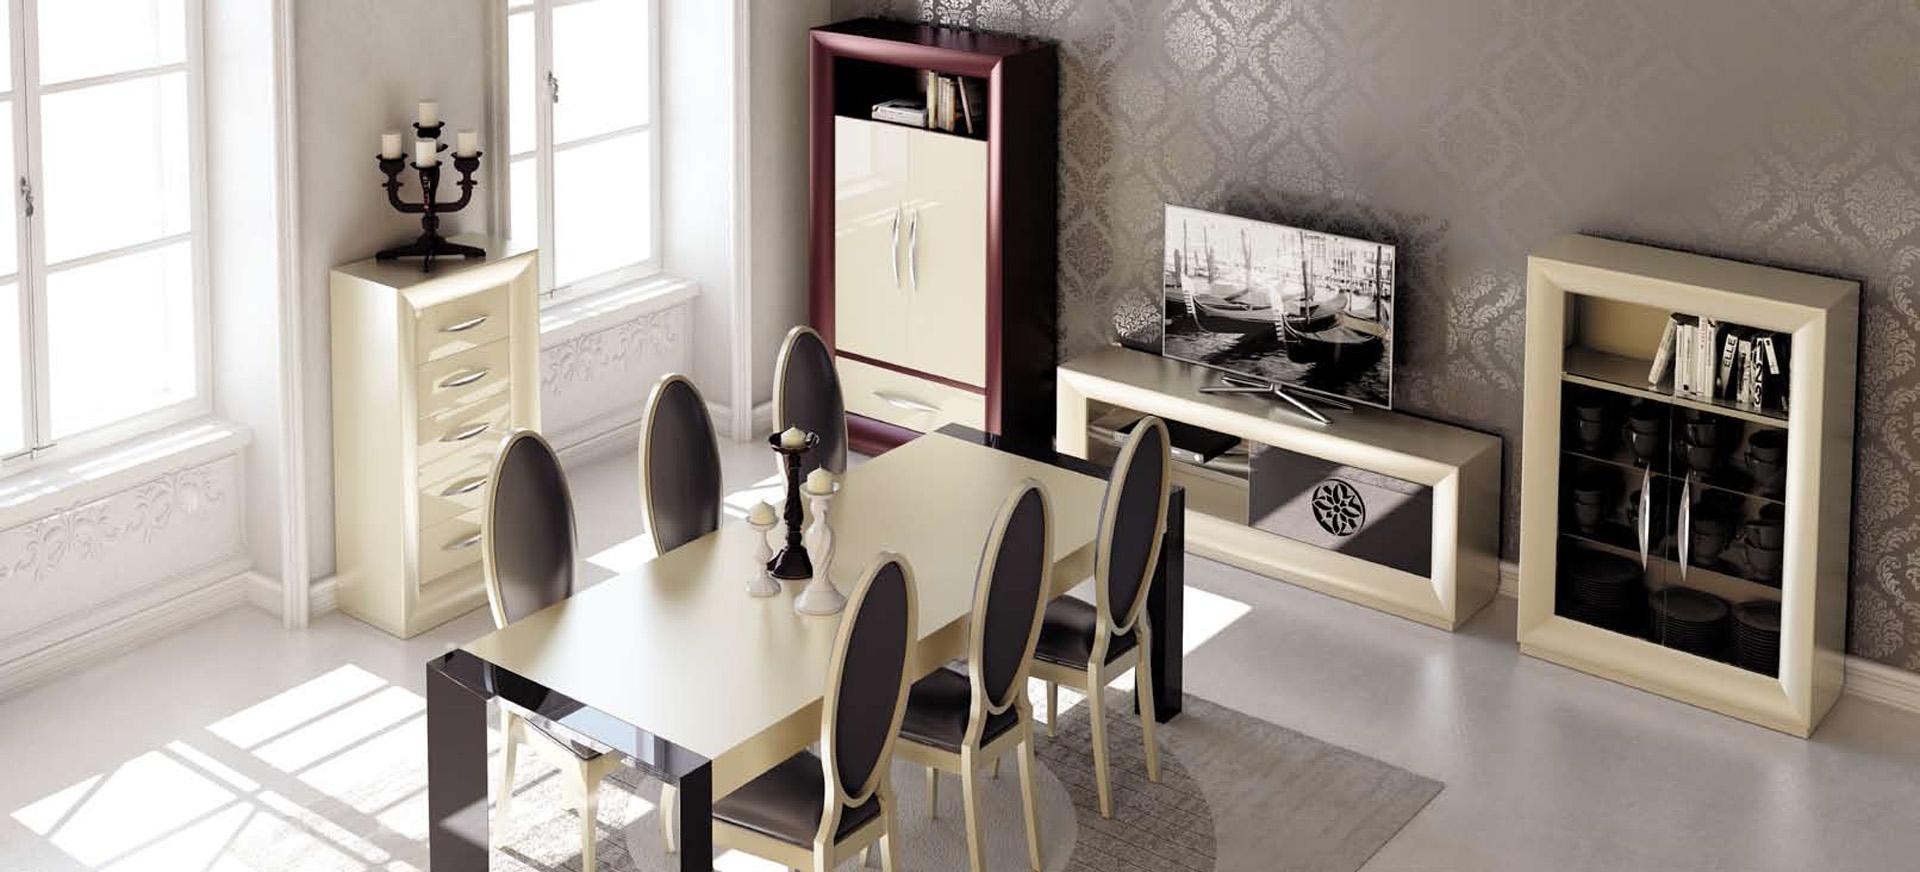 Salones coloniales modernos great muebles coloniales - Salones estilo colonial moderno ...